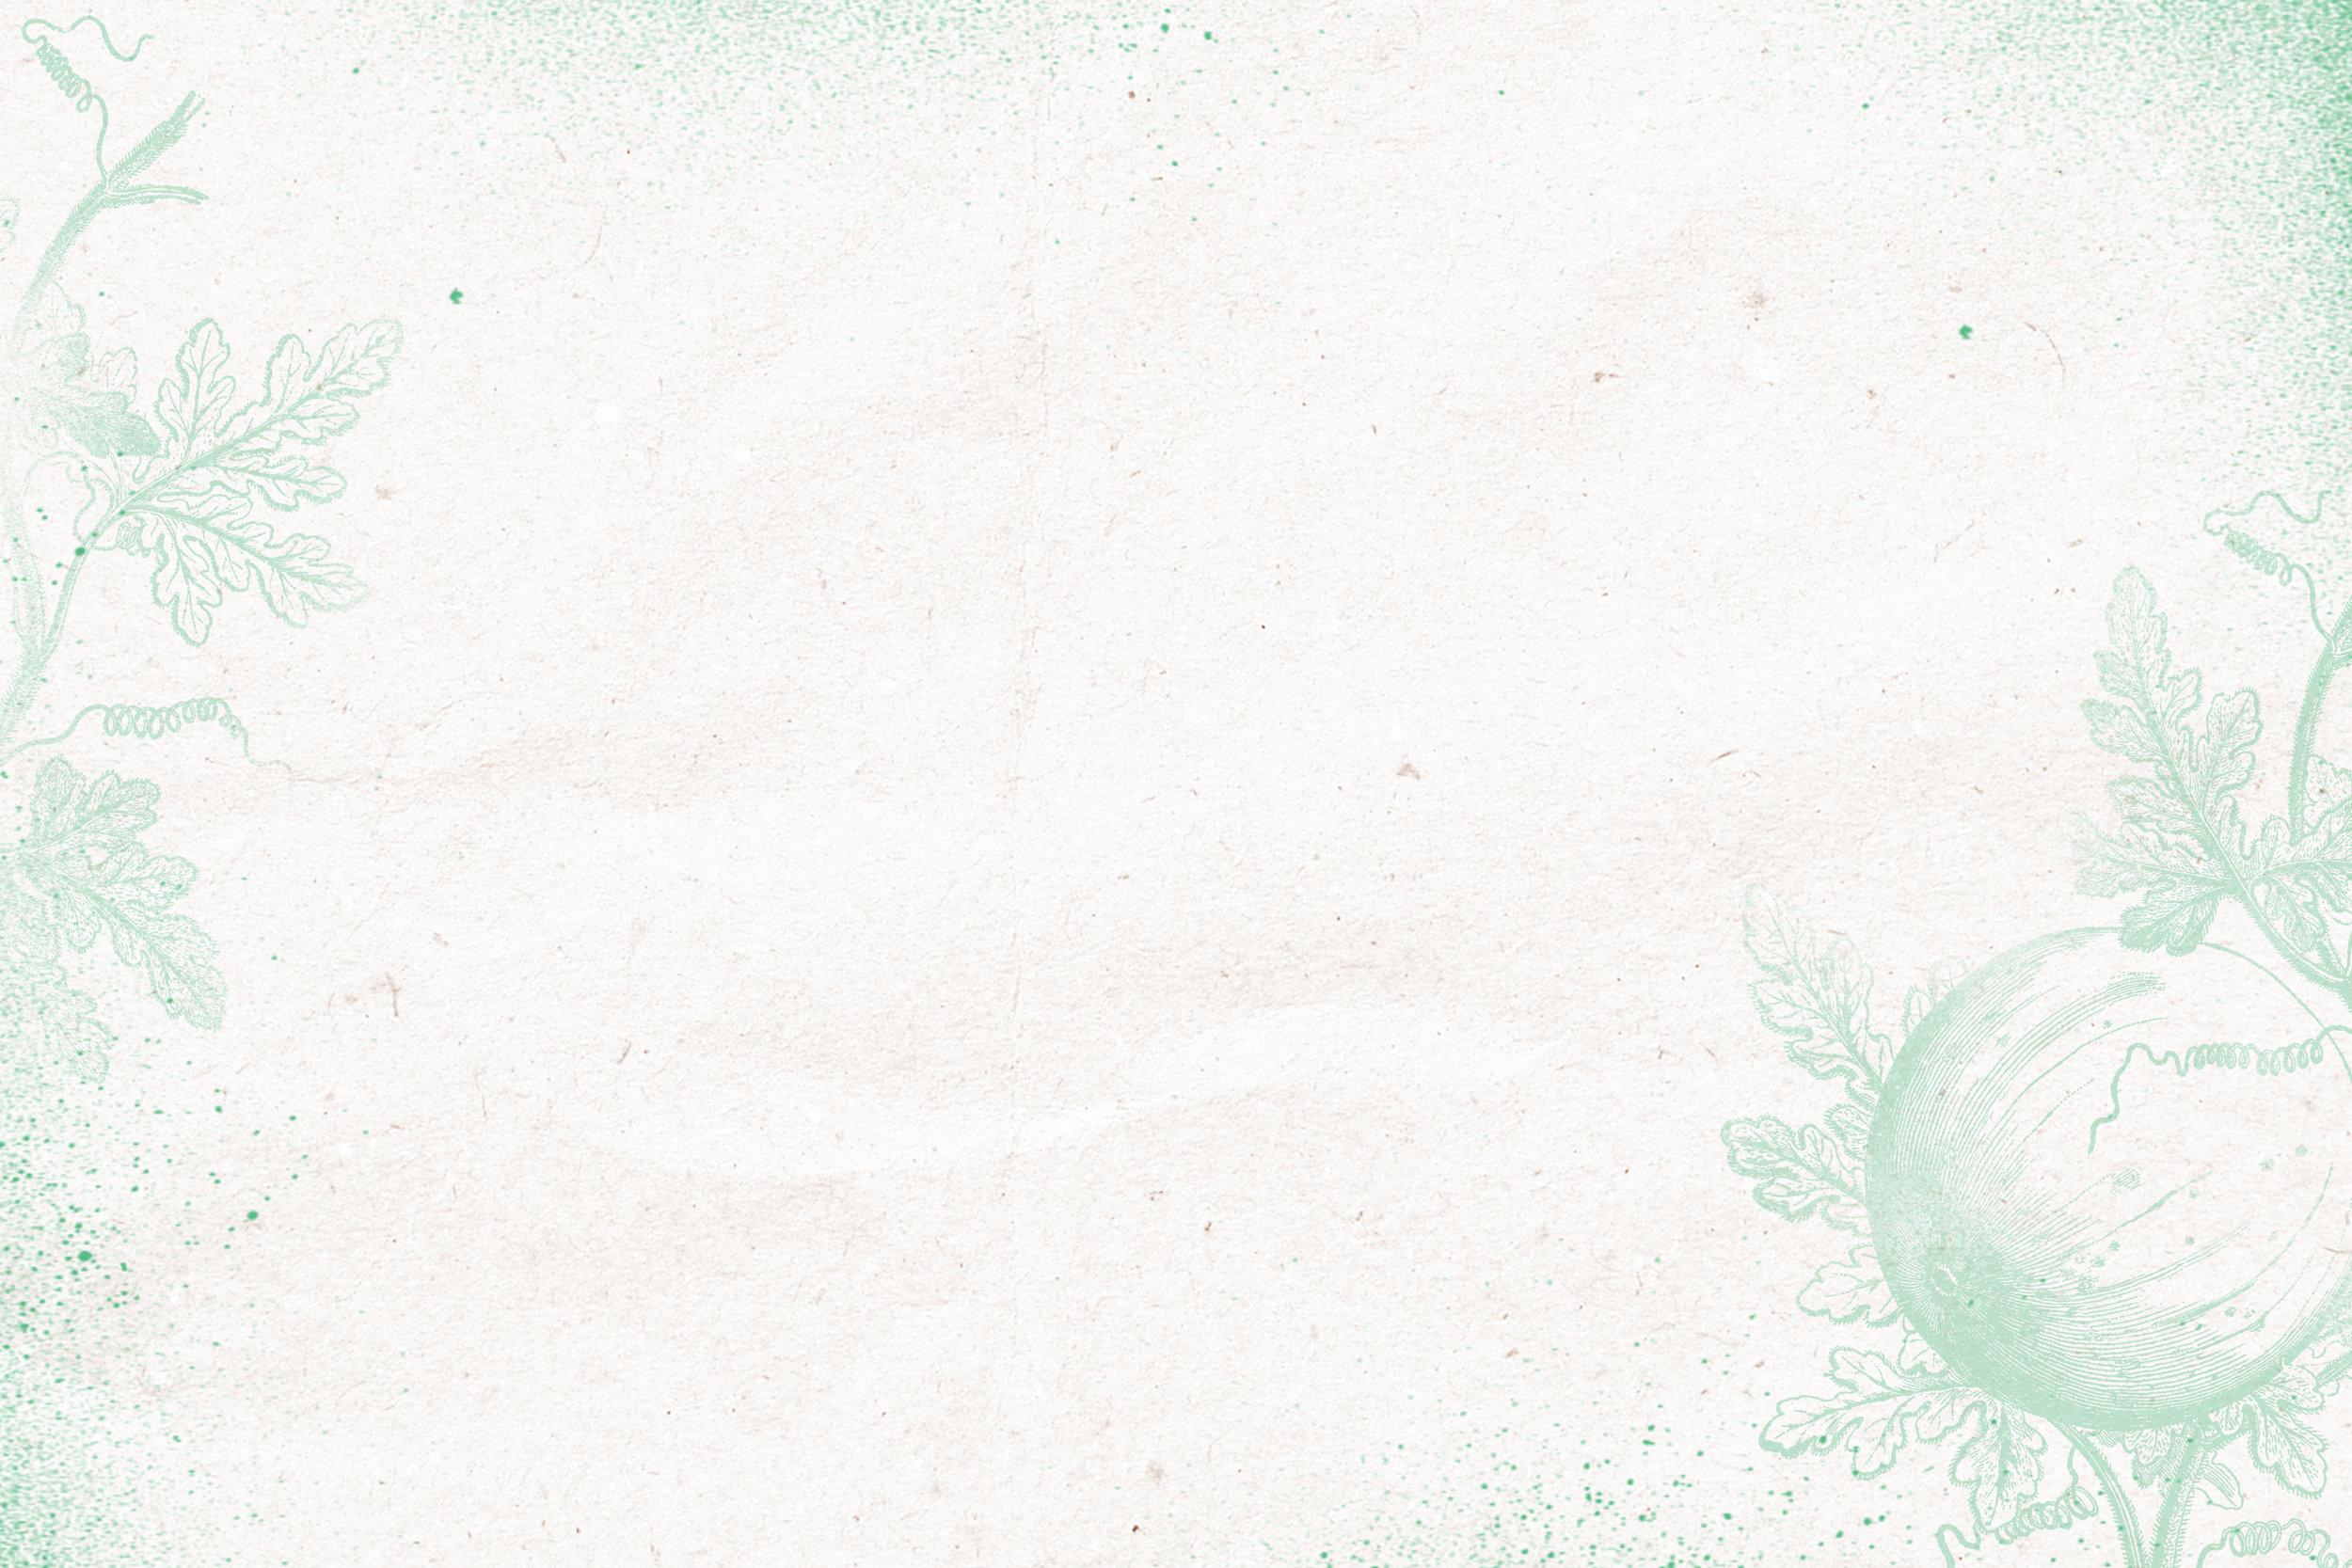 Background+for+Egunsifoods+packaging (1).jpg